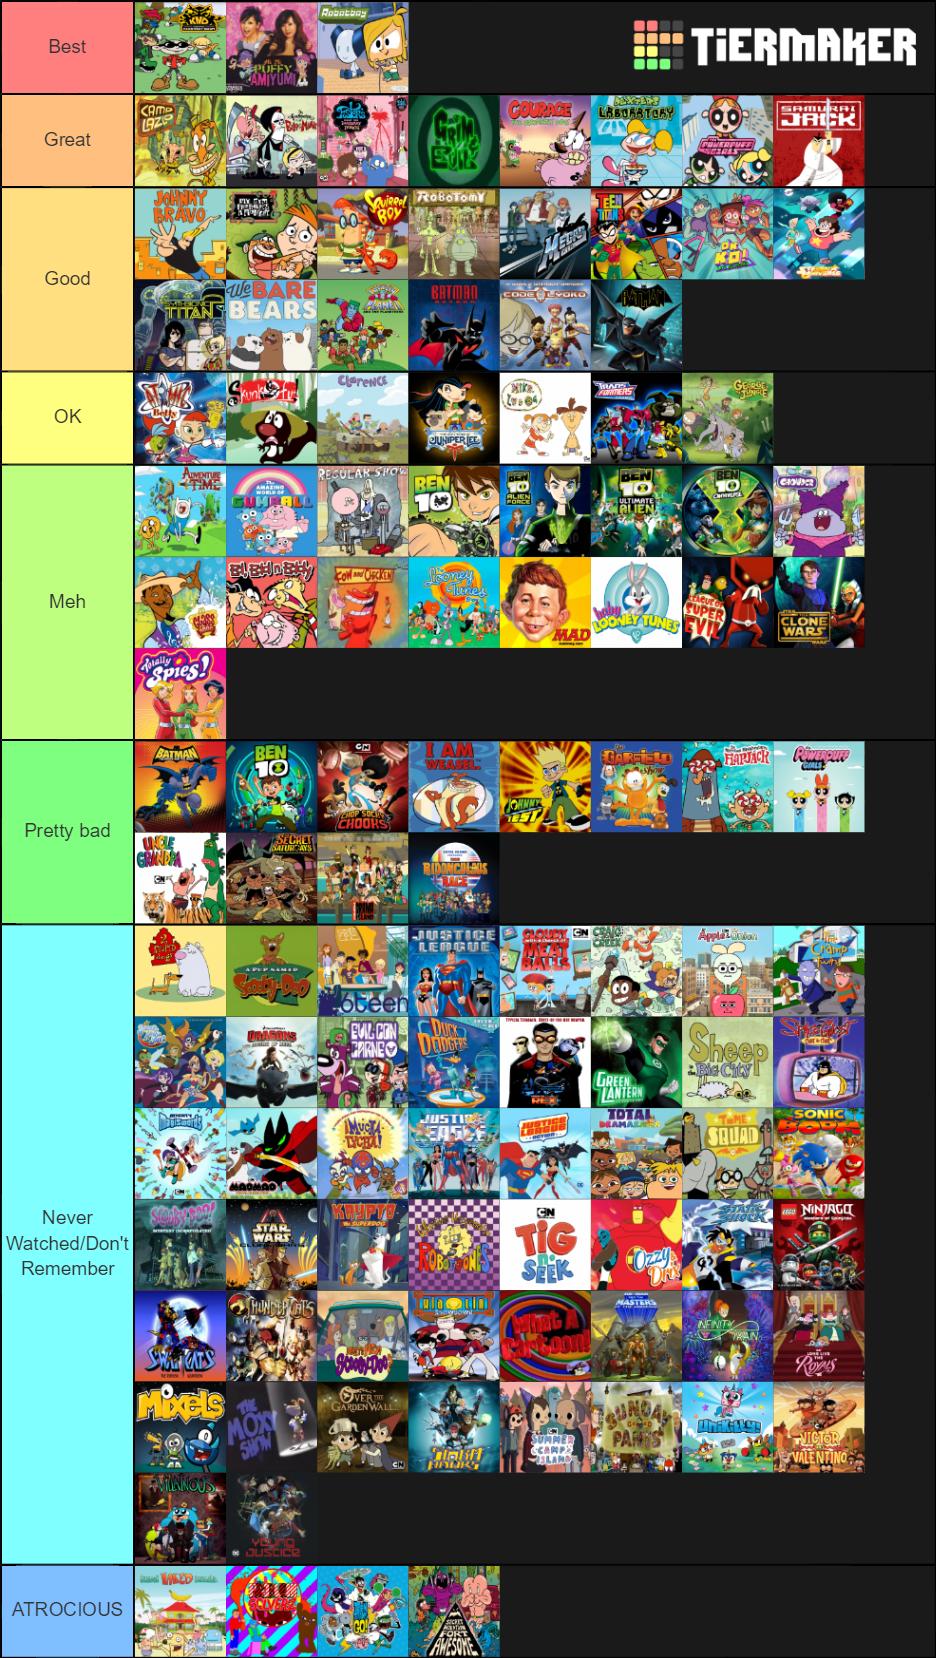 My Cartoon Network Tier List By Arthurengine On Deviantart